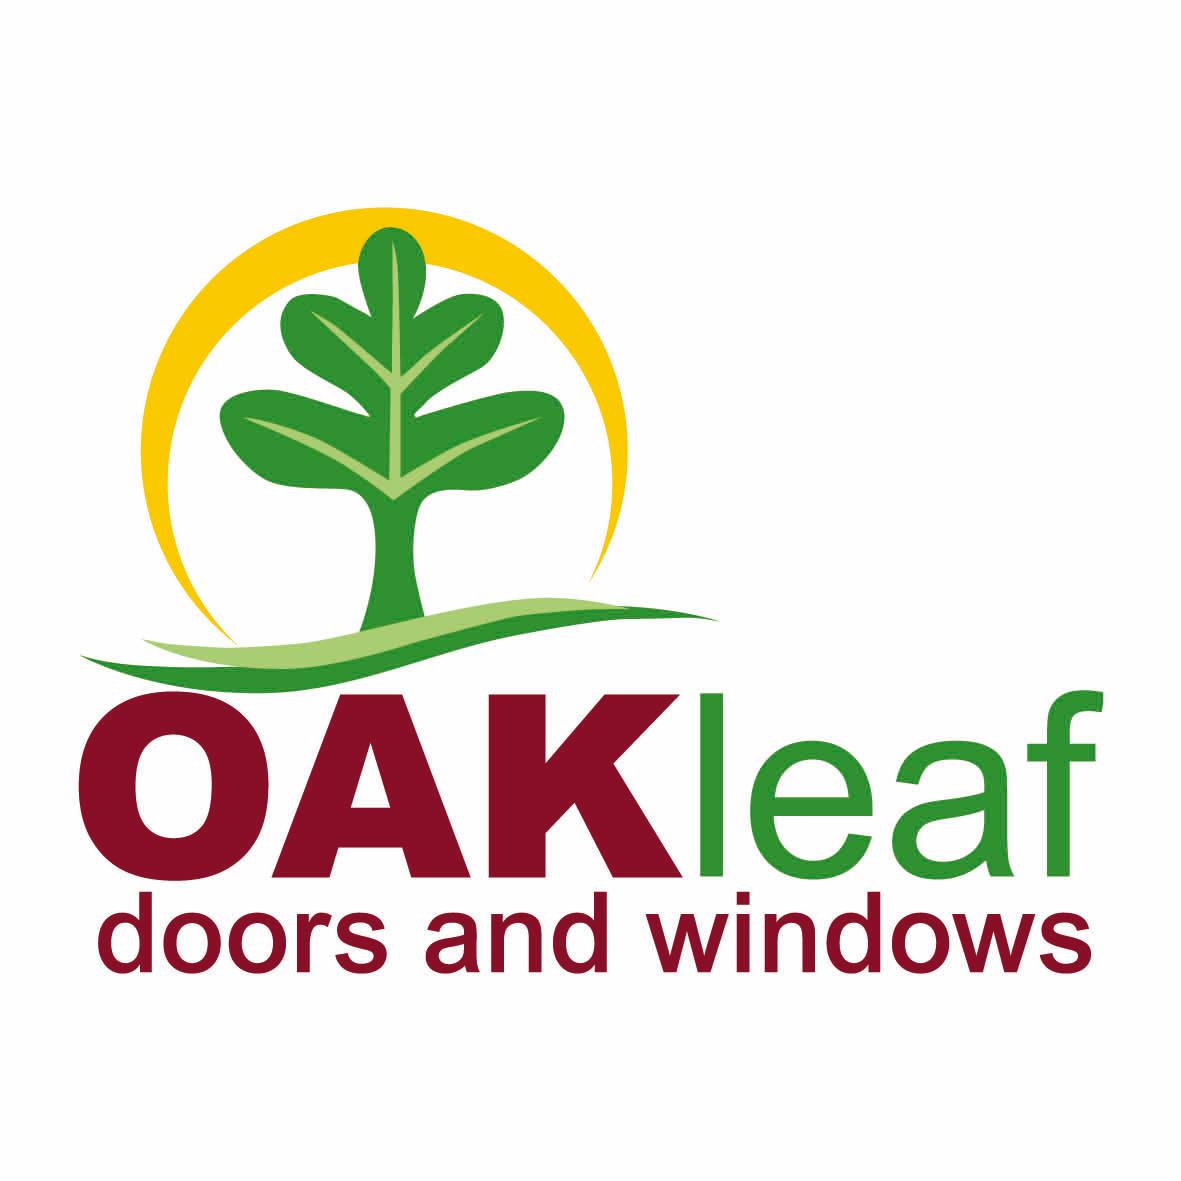 Oakleaf Commercial Services